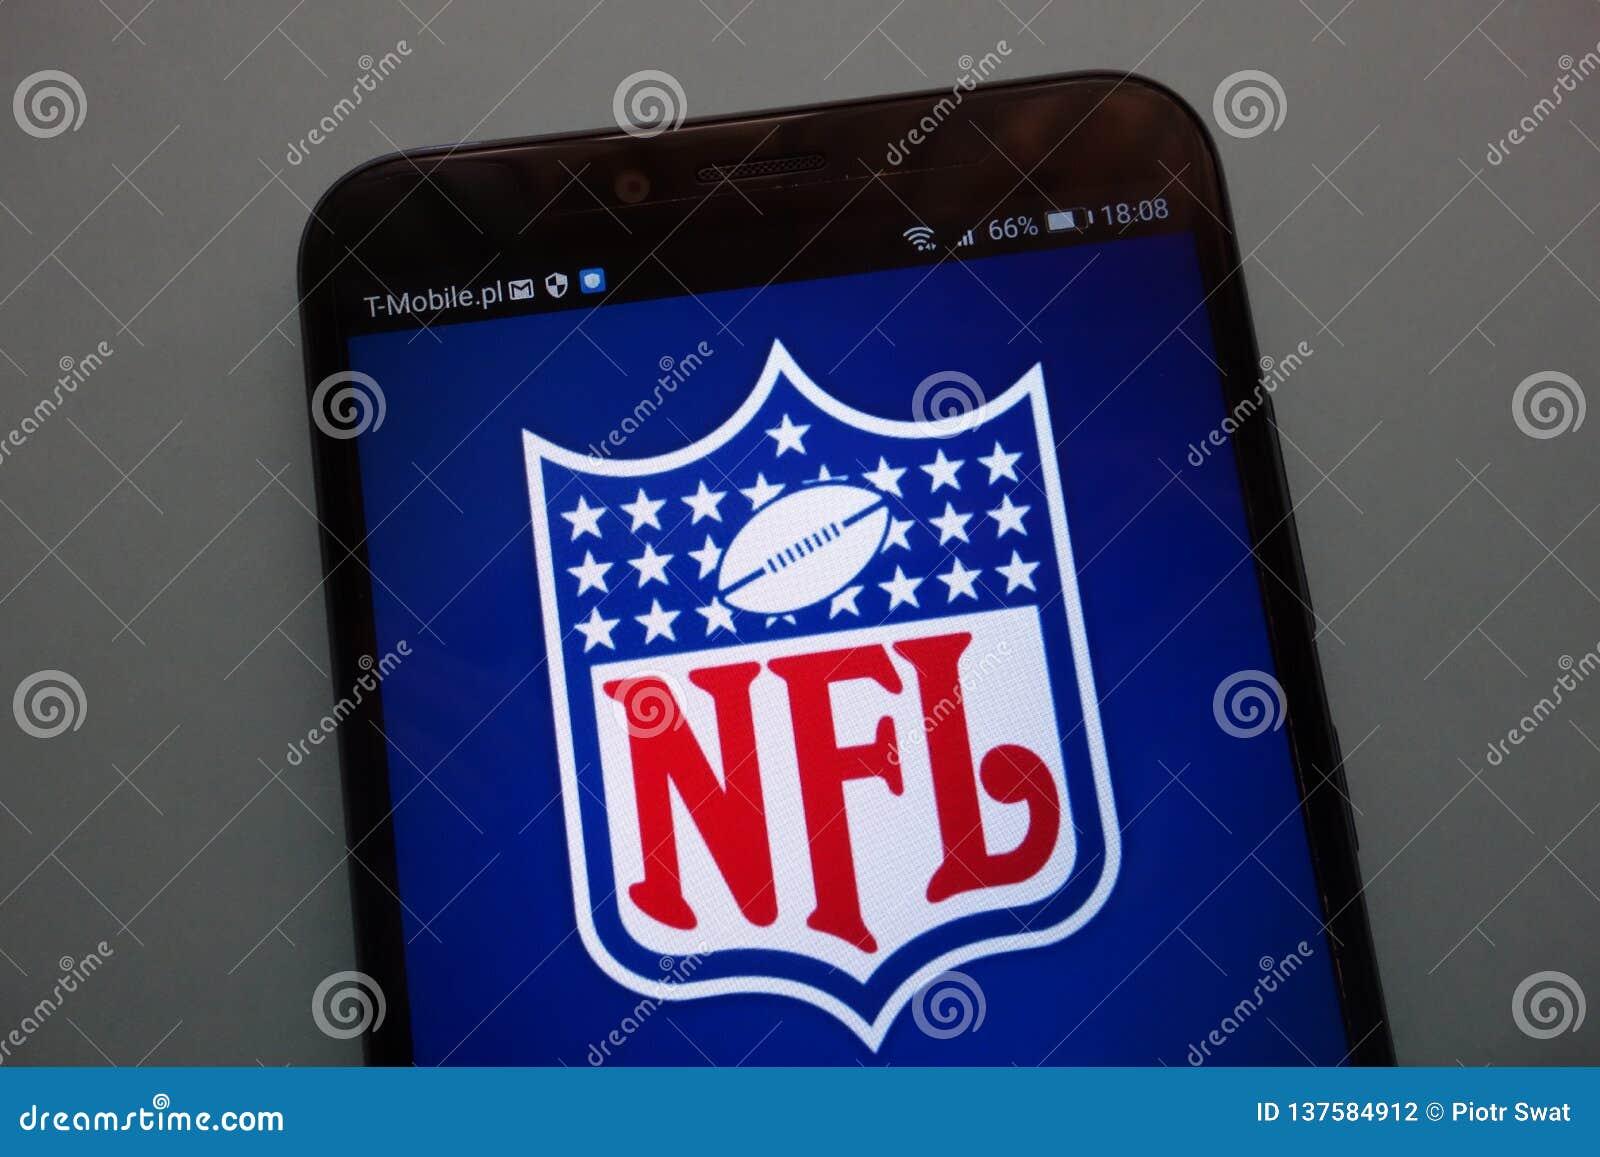 NFL logo on a smartphone